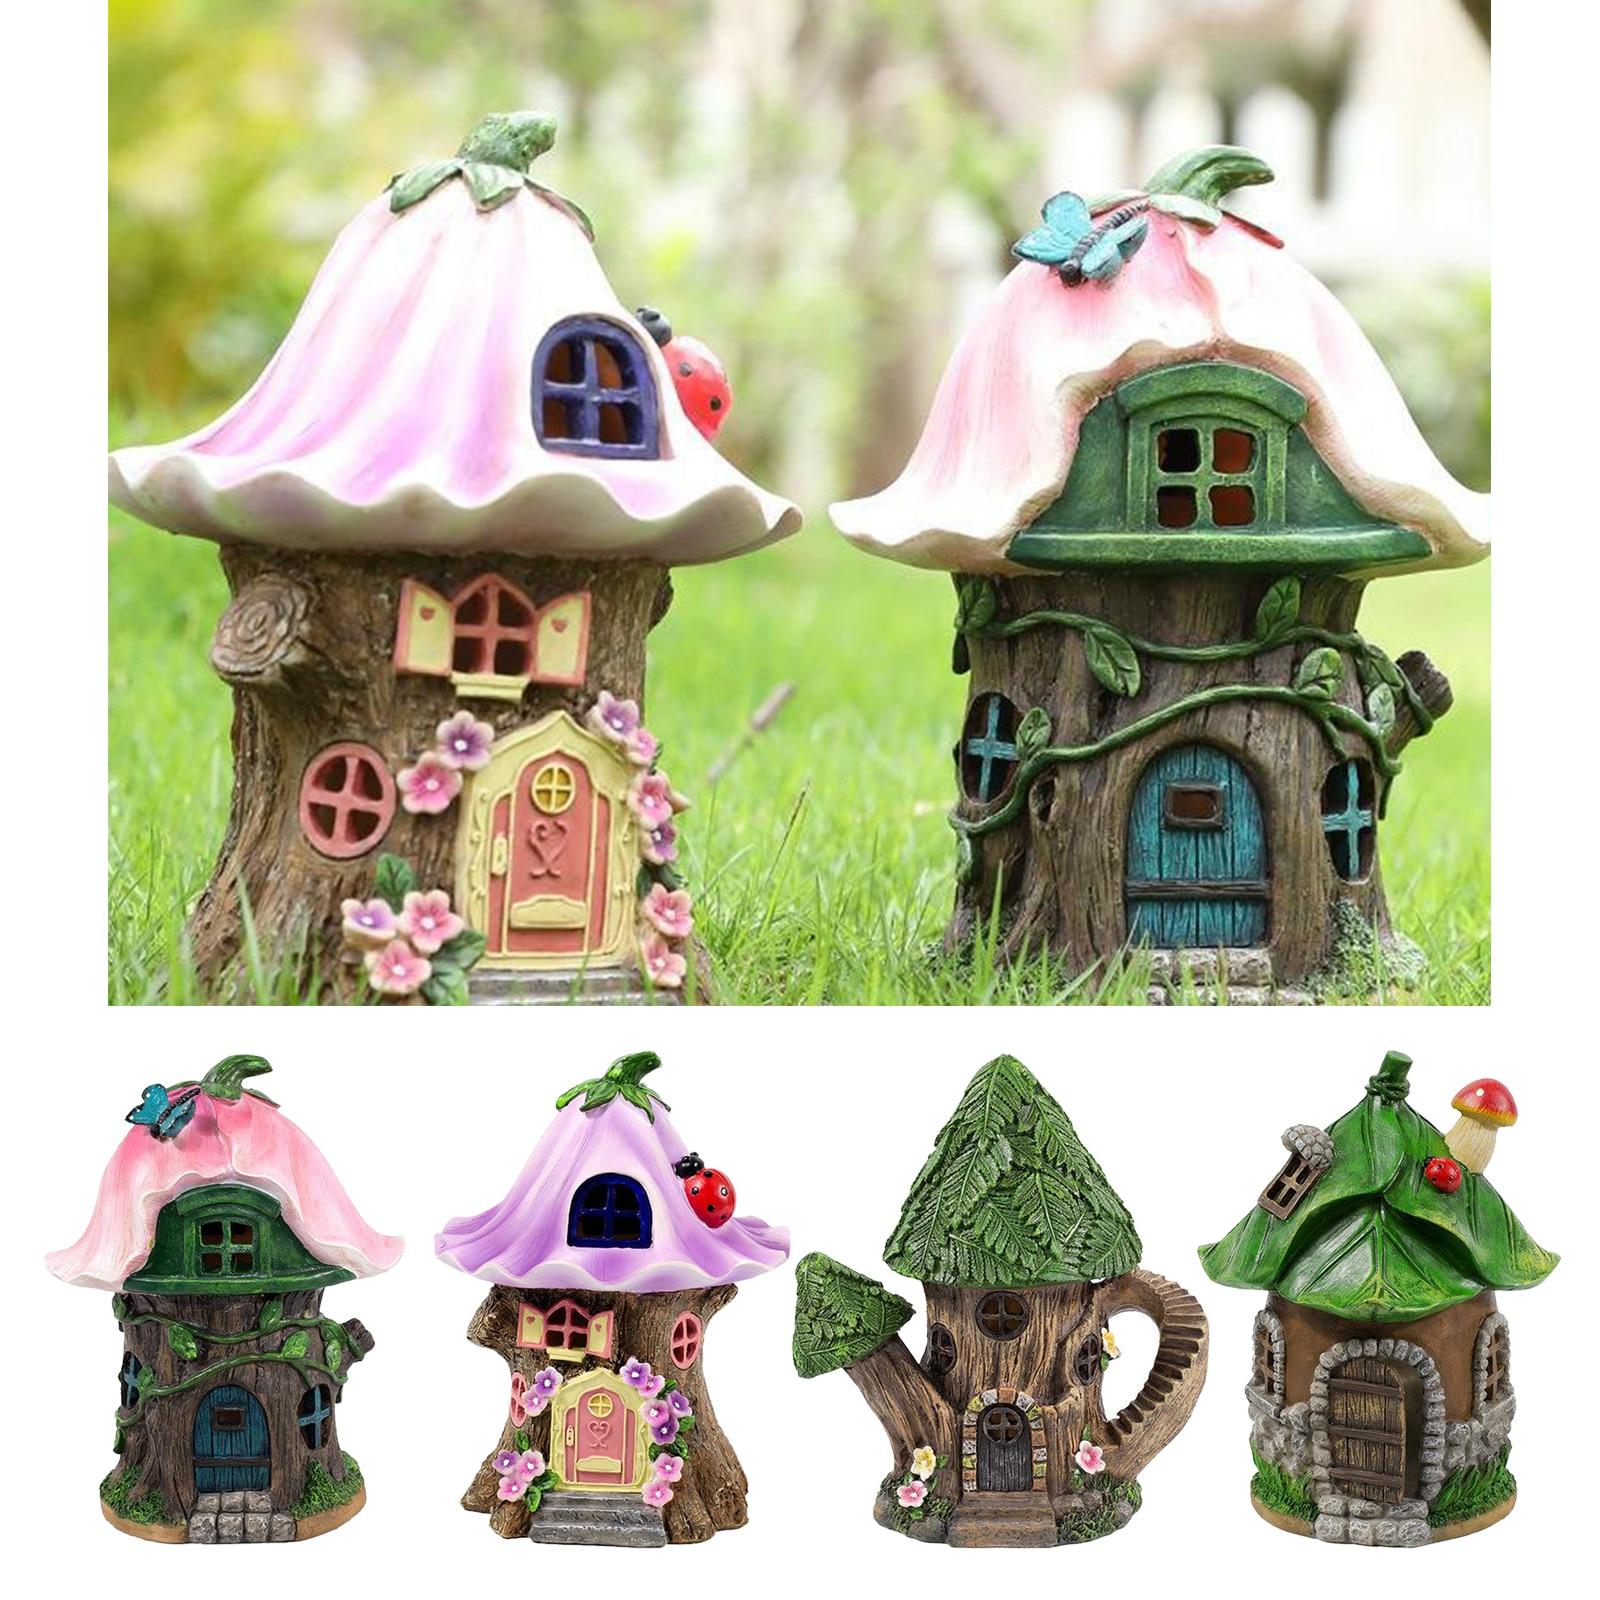 Craft Miniature Fairy House Solar Powered Outdoor Decor LED Garden Light Outdoor Decoration Led Light Yard Walkway